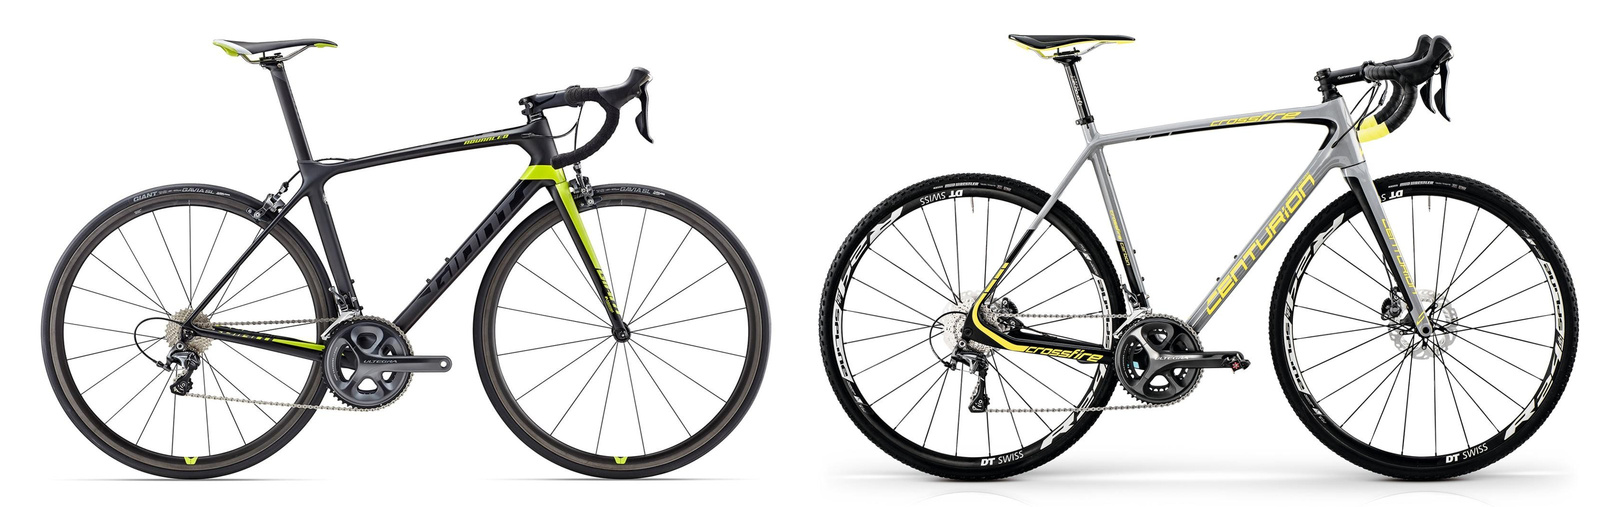 Cyclocross & Gravel Bike zum Bestpreis kaufen   RABE Bike